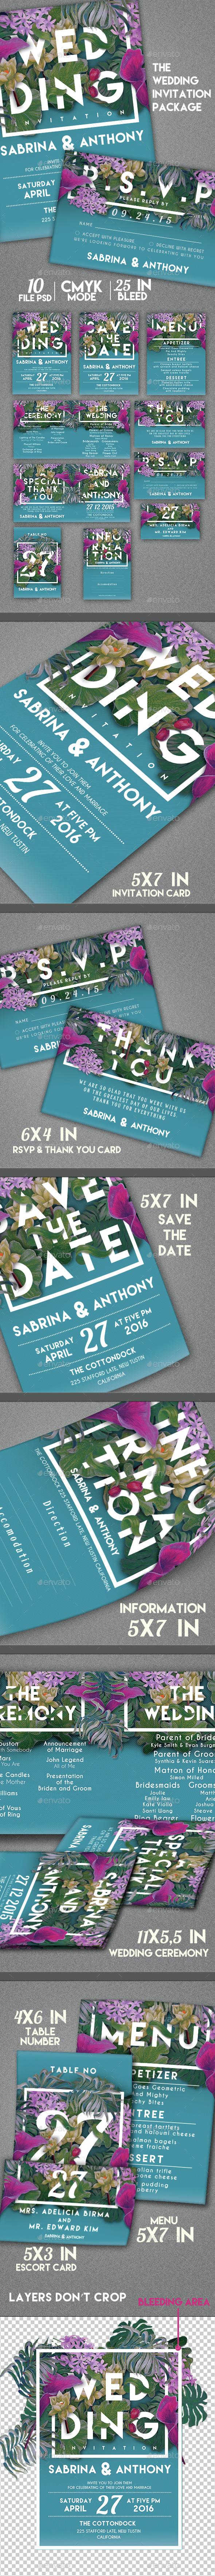 Wedding Invitation Package - Invitations Cards & Invites